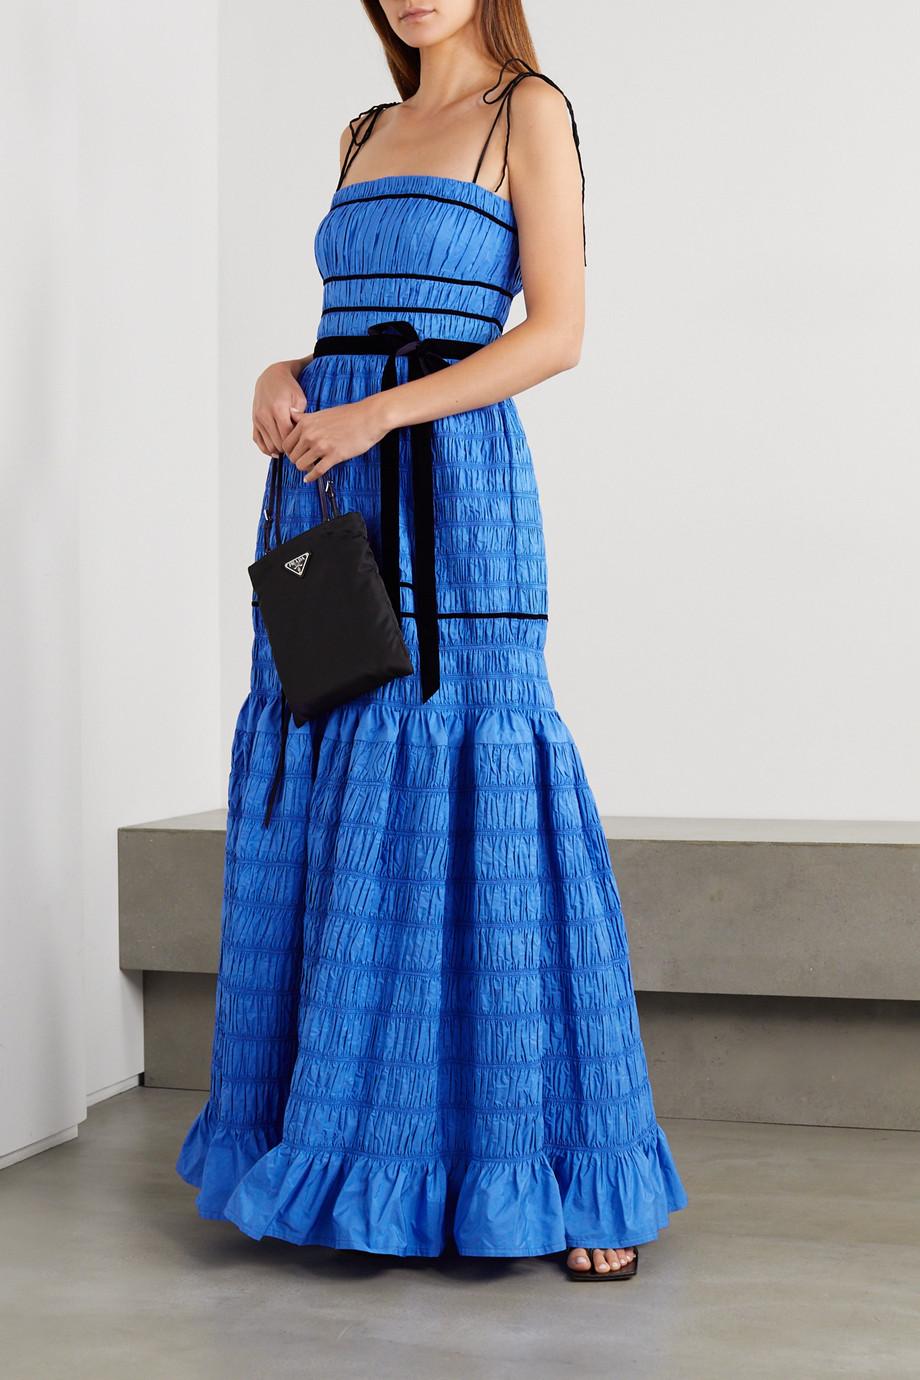 Molly Goddard Minnie velvet-trimmed shirred tiered taffeta gown